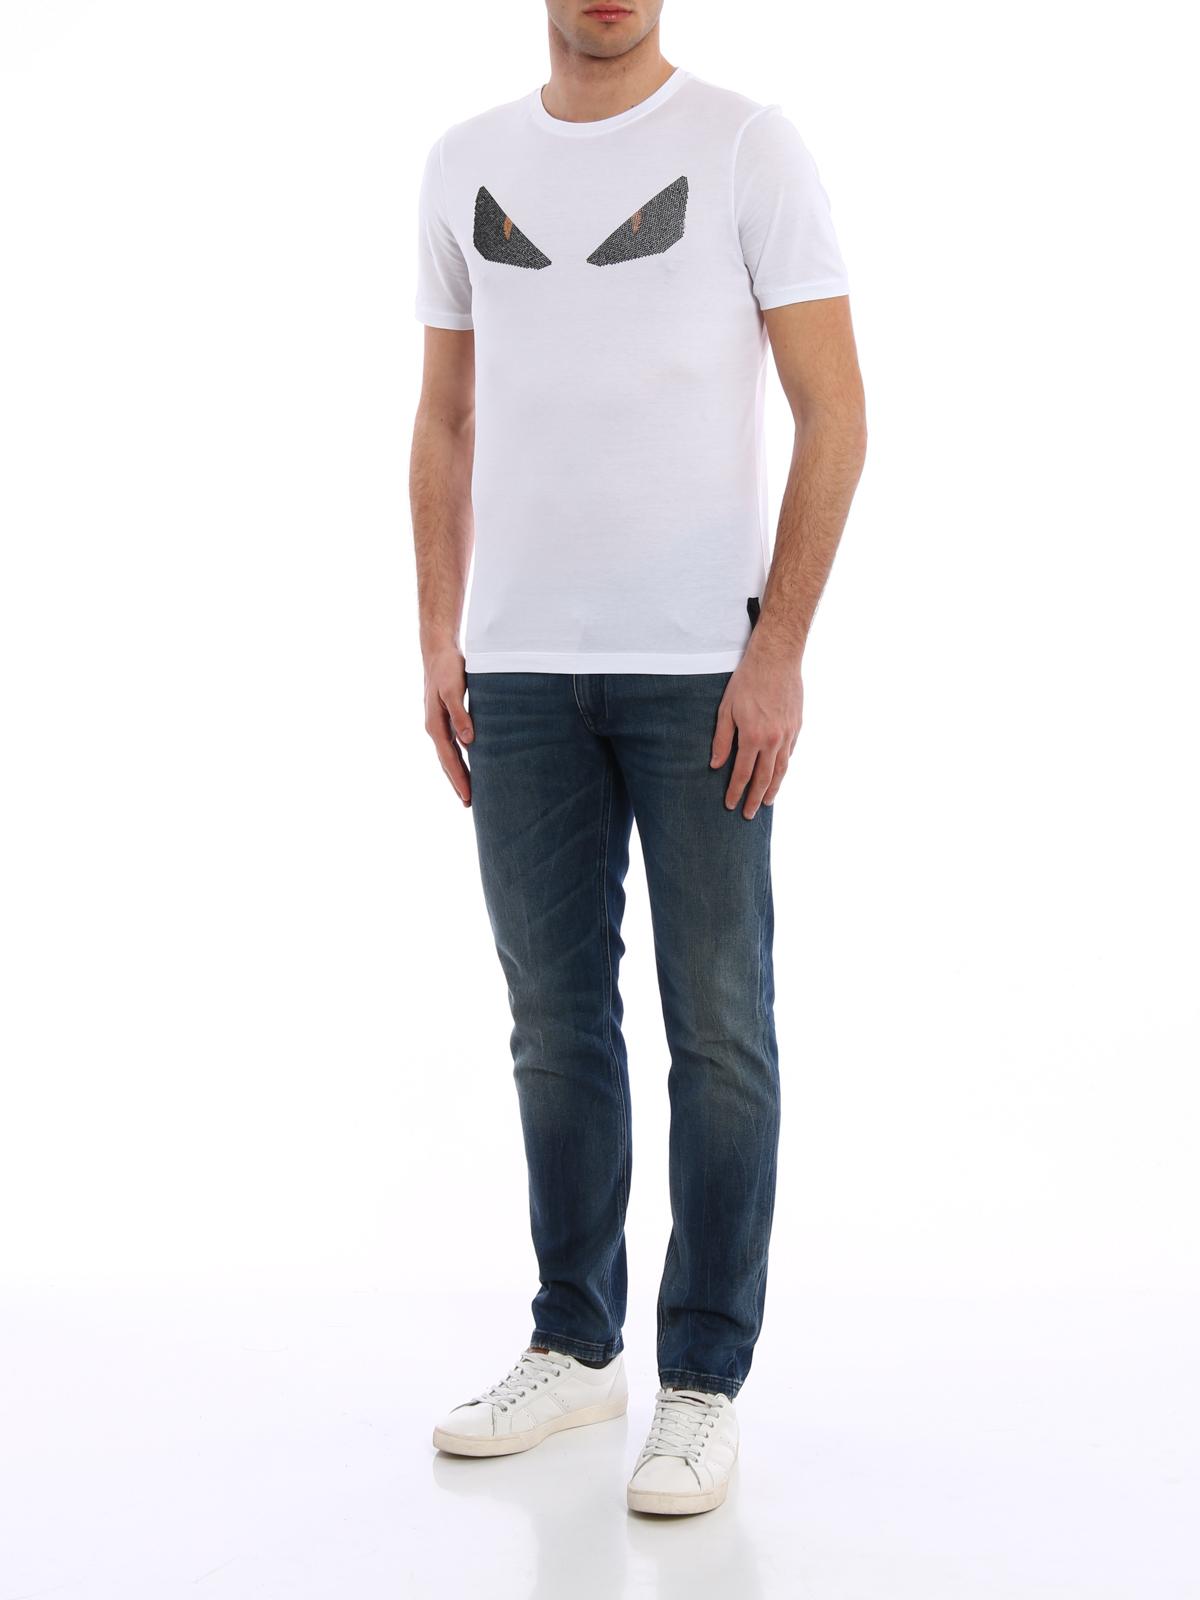 6620521f9dd3 Fendi - Monster eye rhinestone T-shirt - t-shirts - FY0682 1JJ QA0